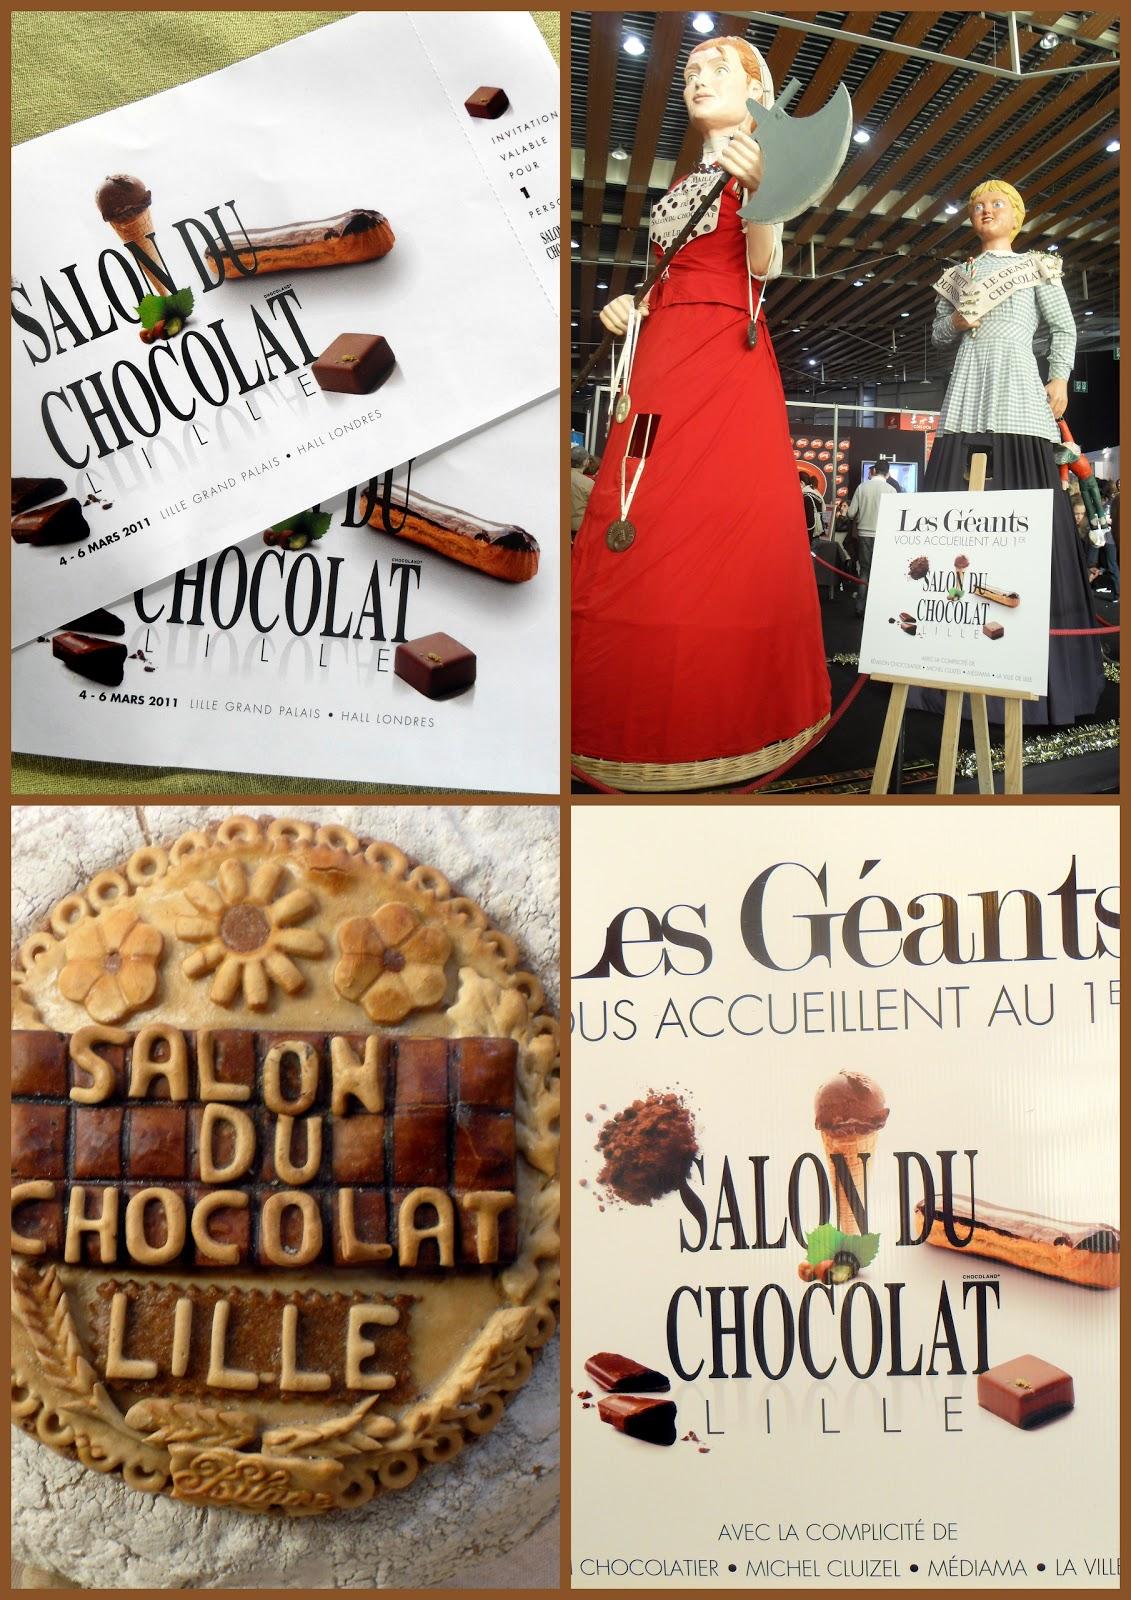 Entr e gratuite salon du chocolat 2011 - Invitation gratuite salon du chocolat ...